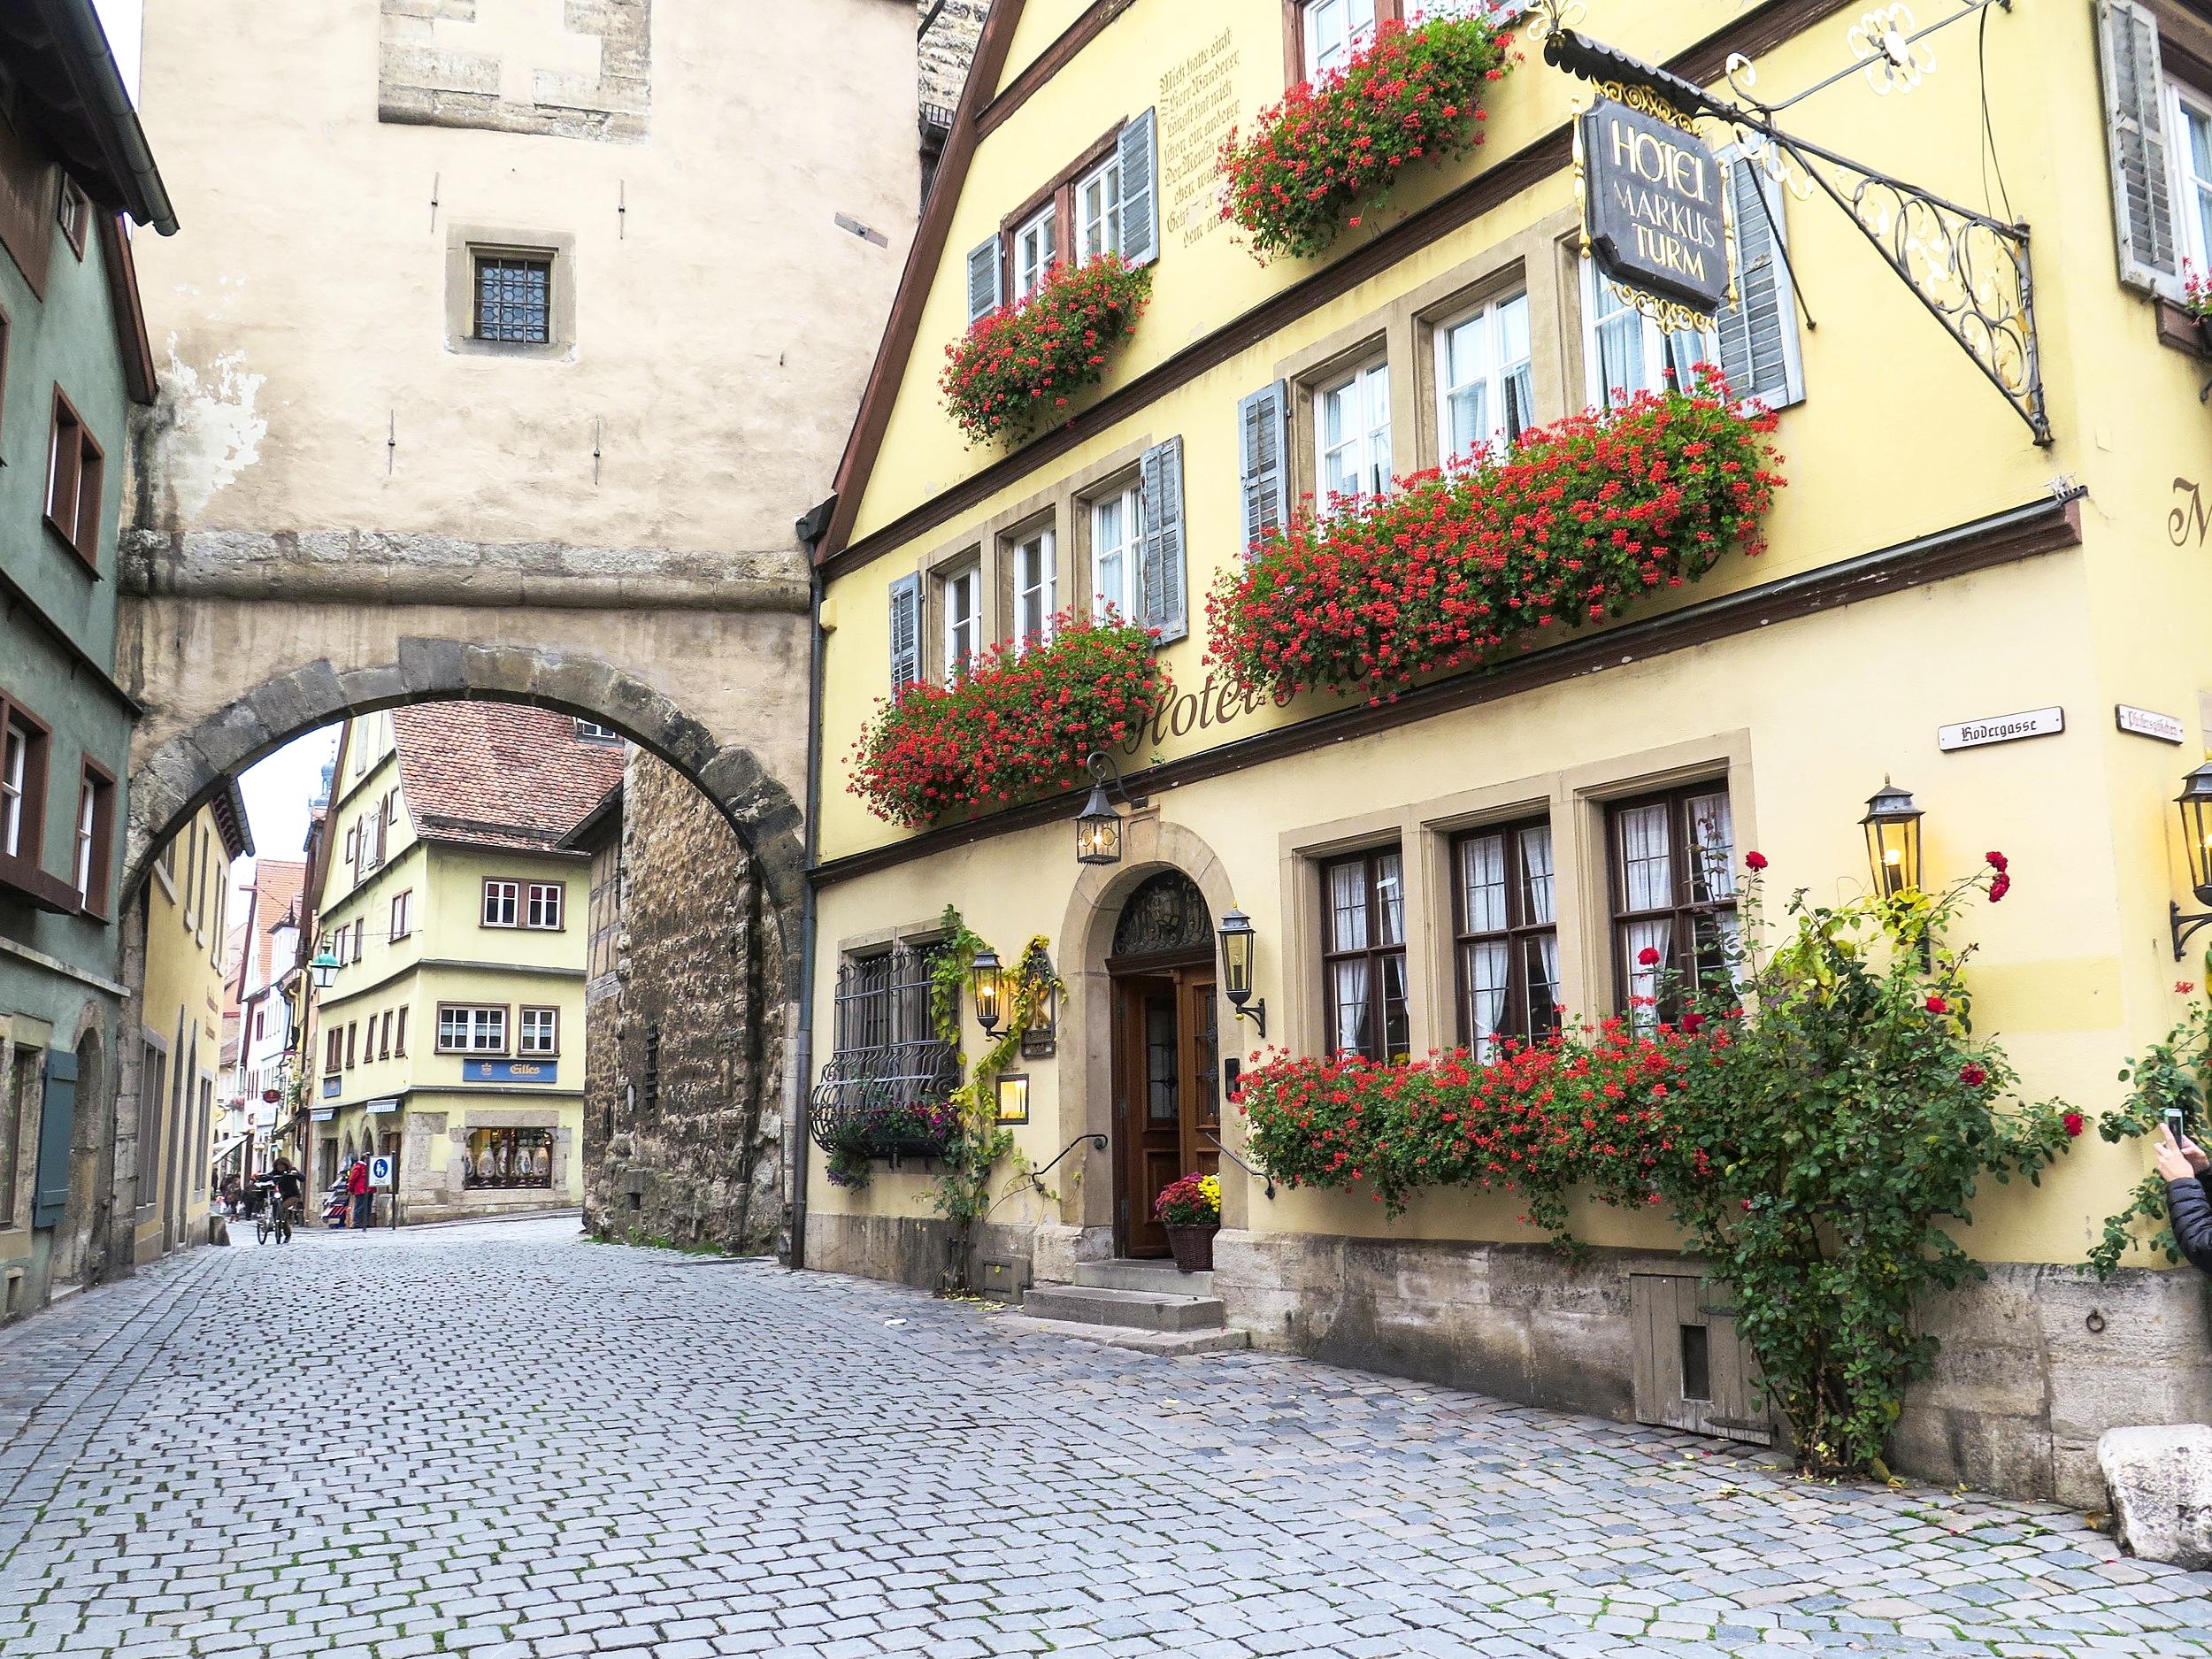 Germany_Blog_Edits1-2.jpg